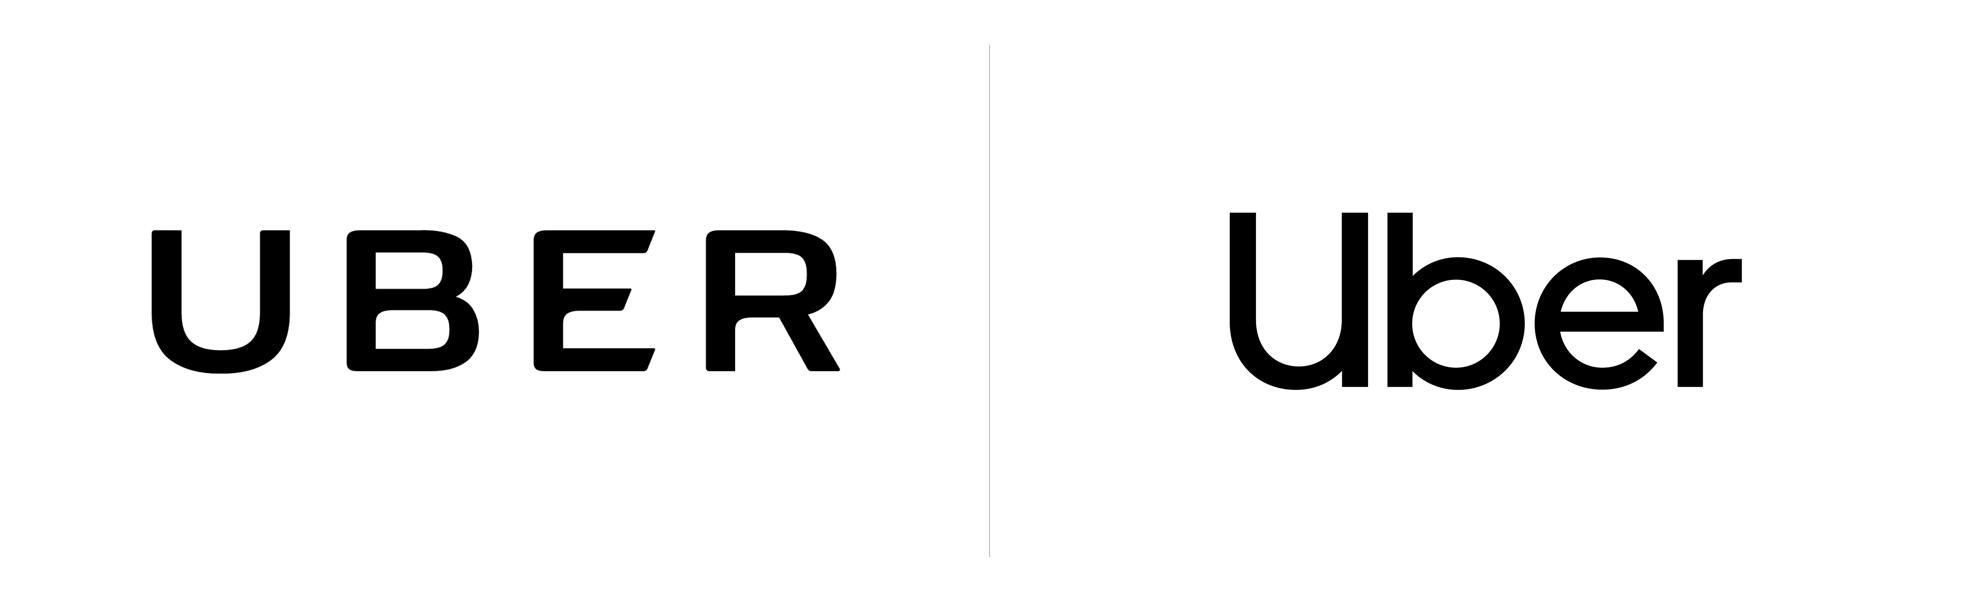 nowe istare logo ubera